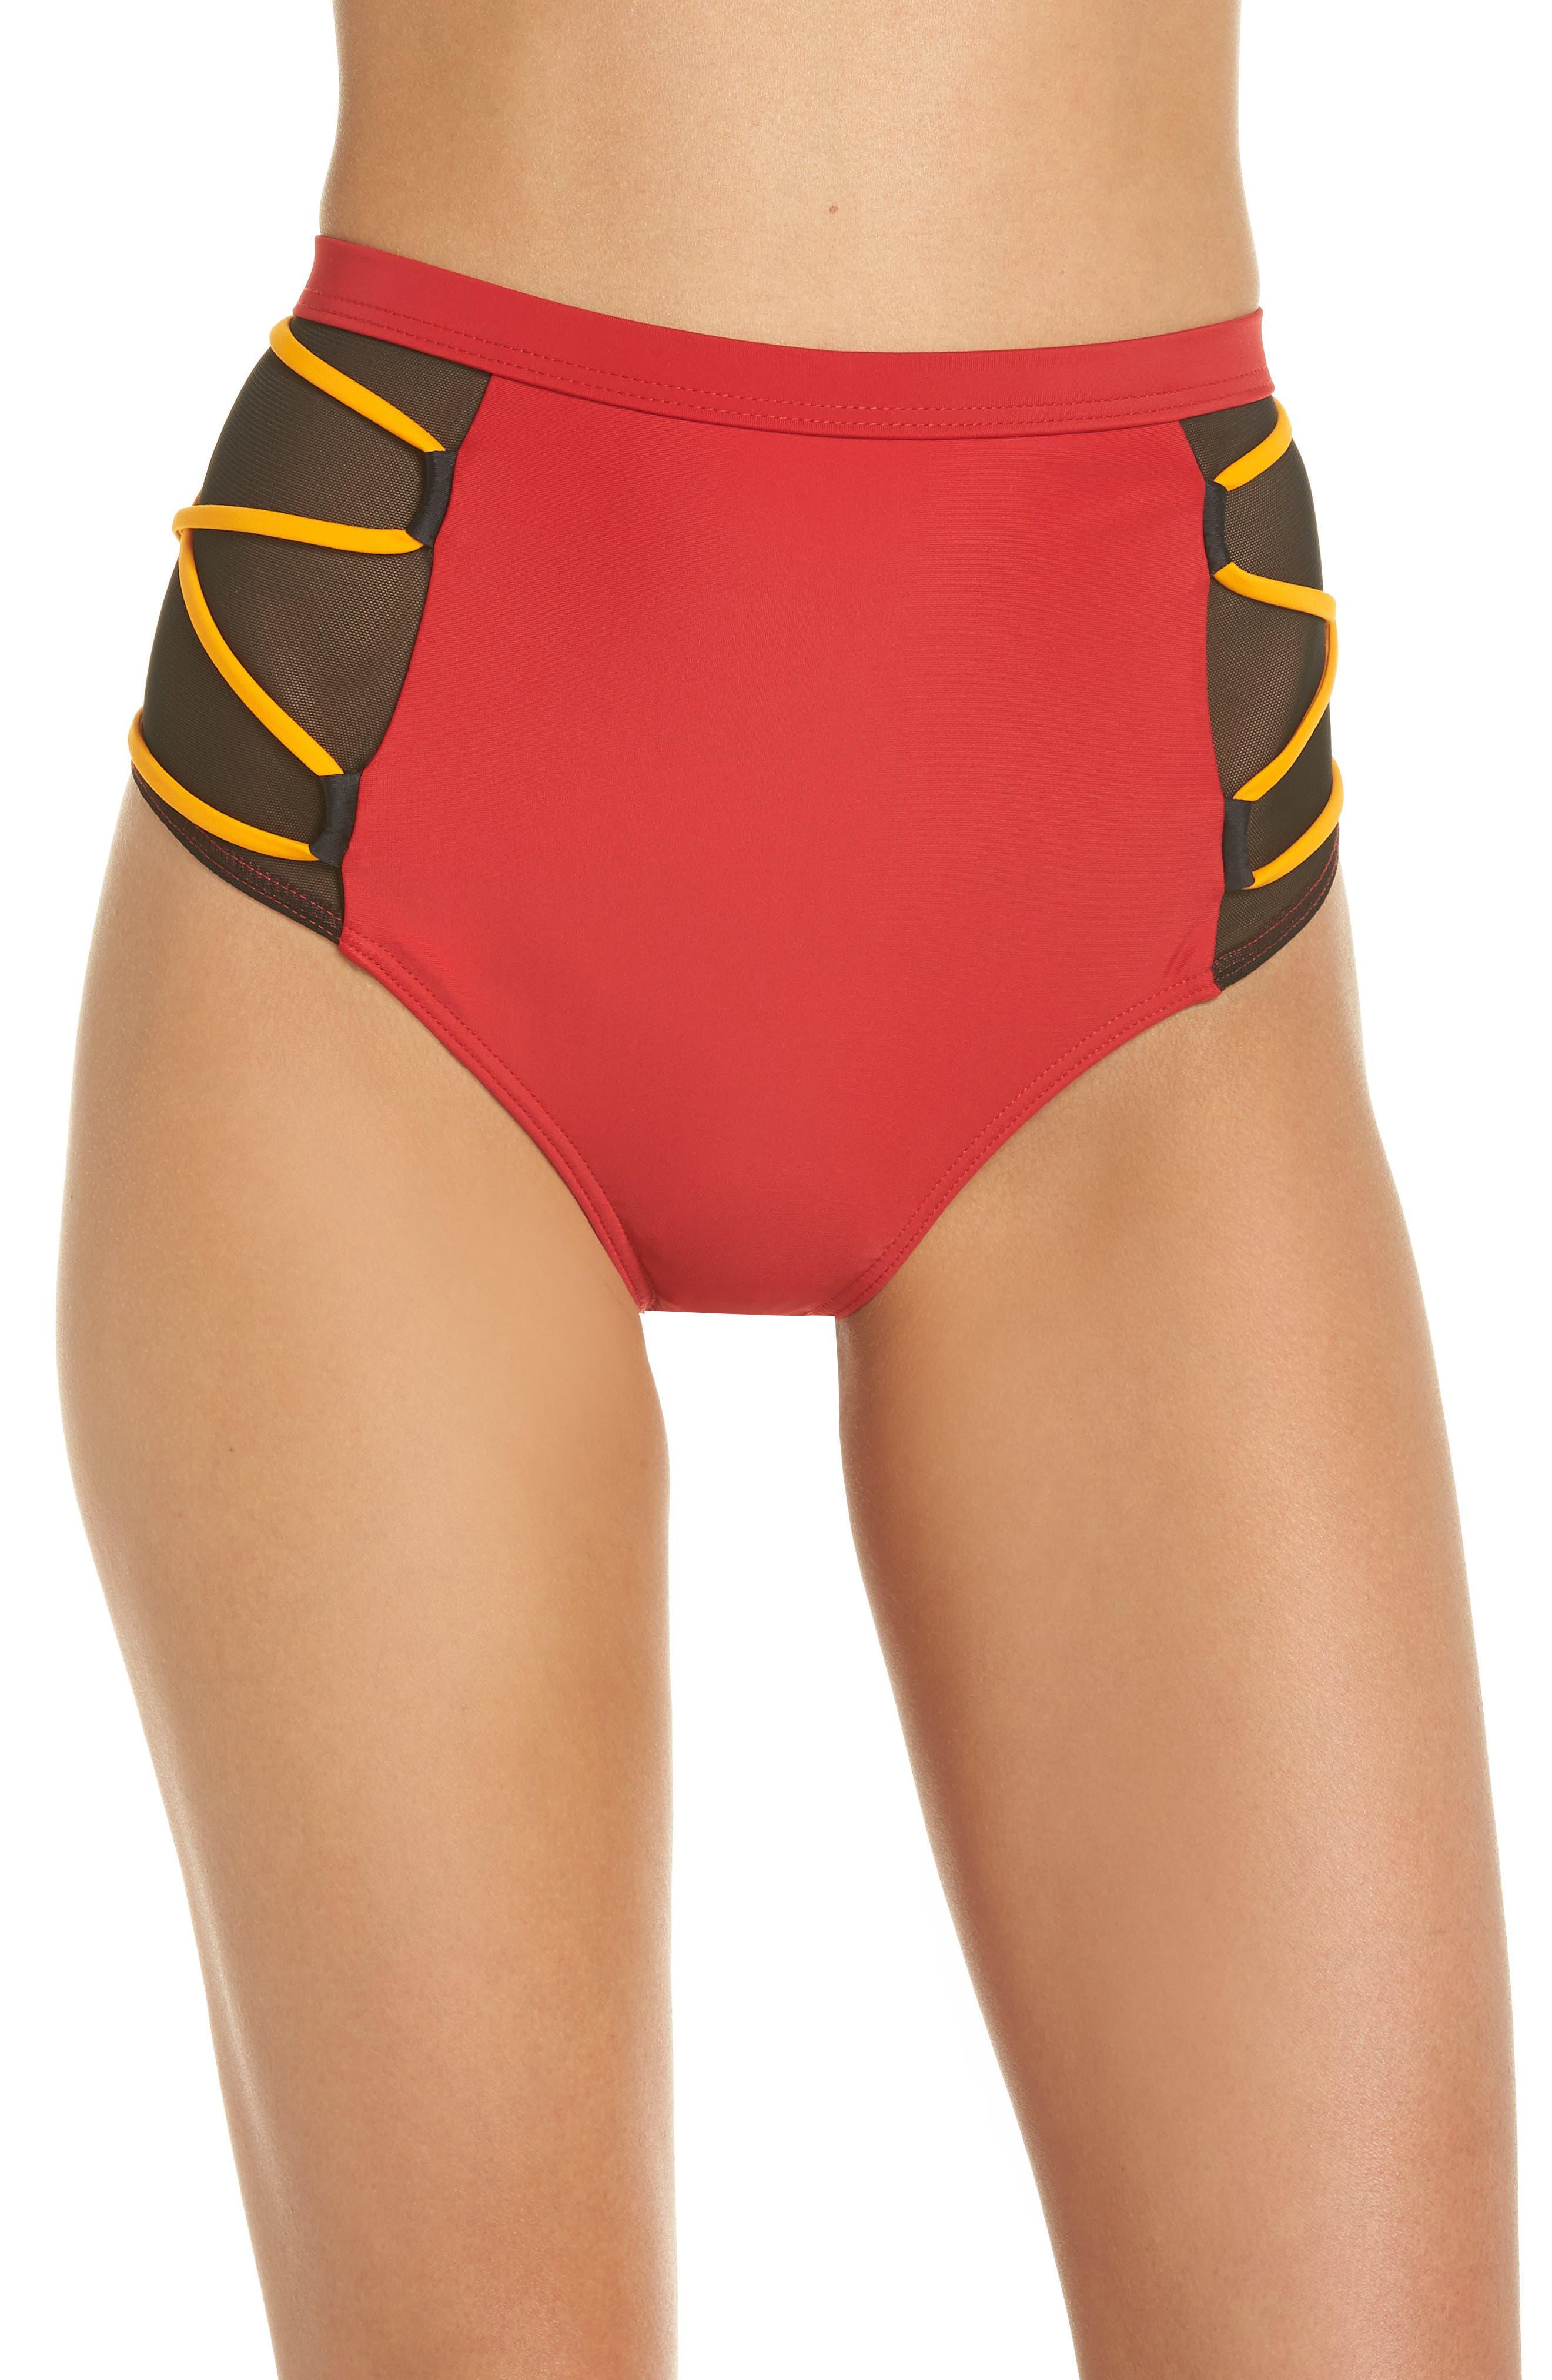 Launch Bikini Bottoms,                             Main thumbnail 1, color,                             Red/ Black/ Orange